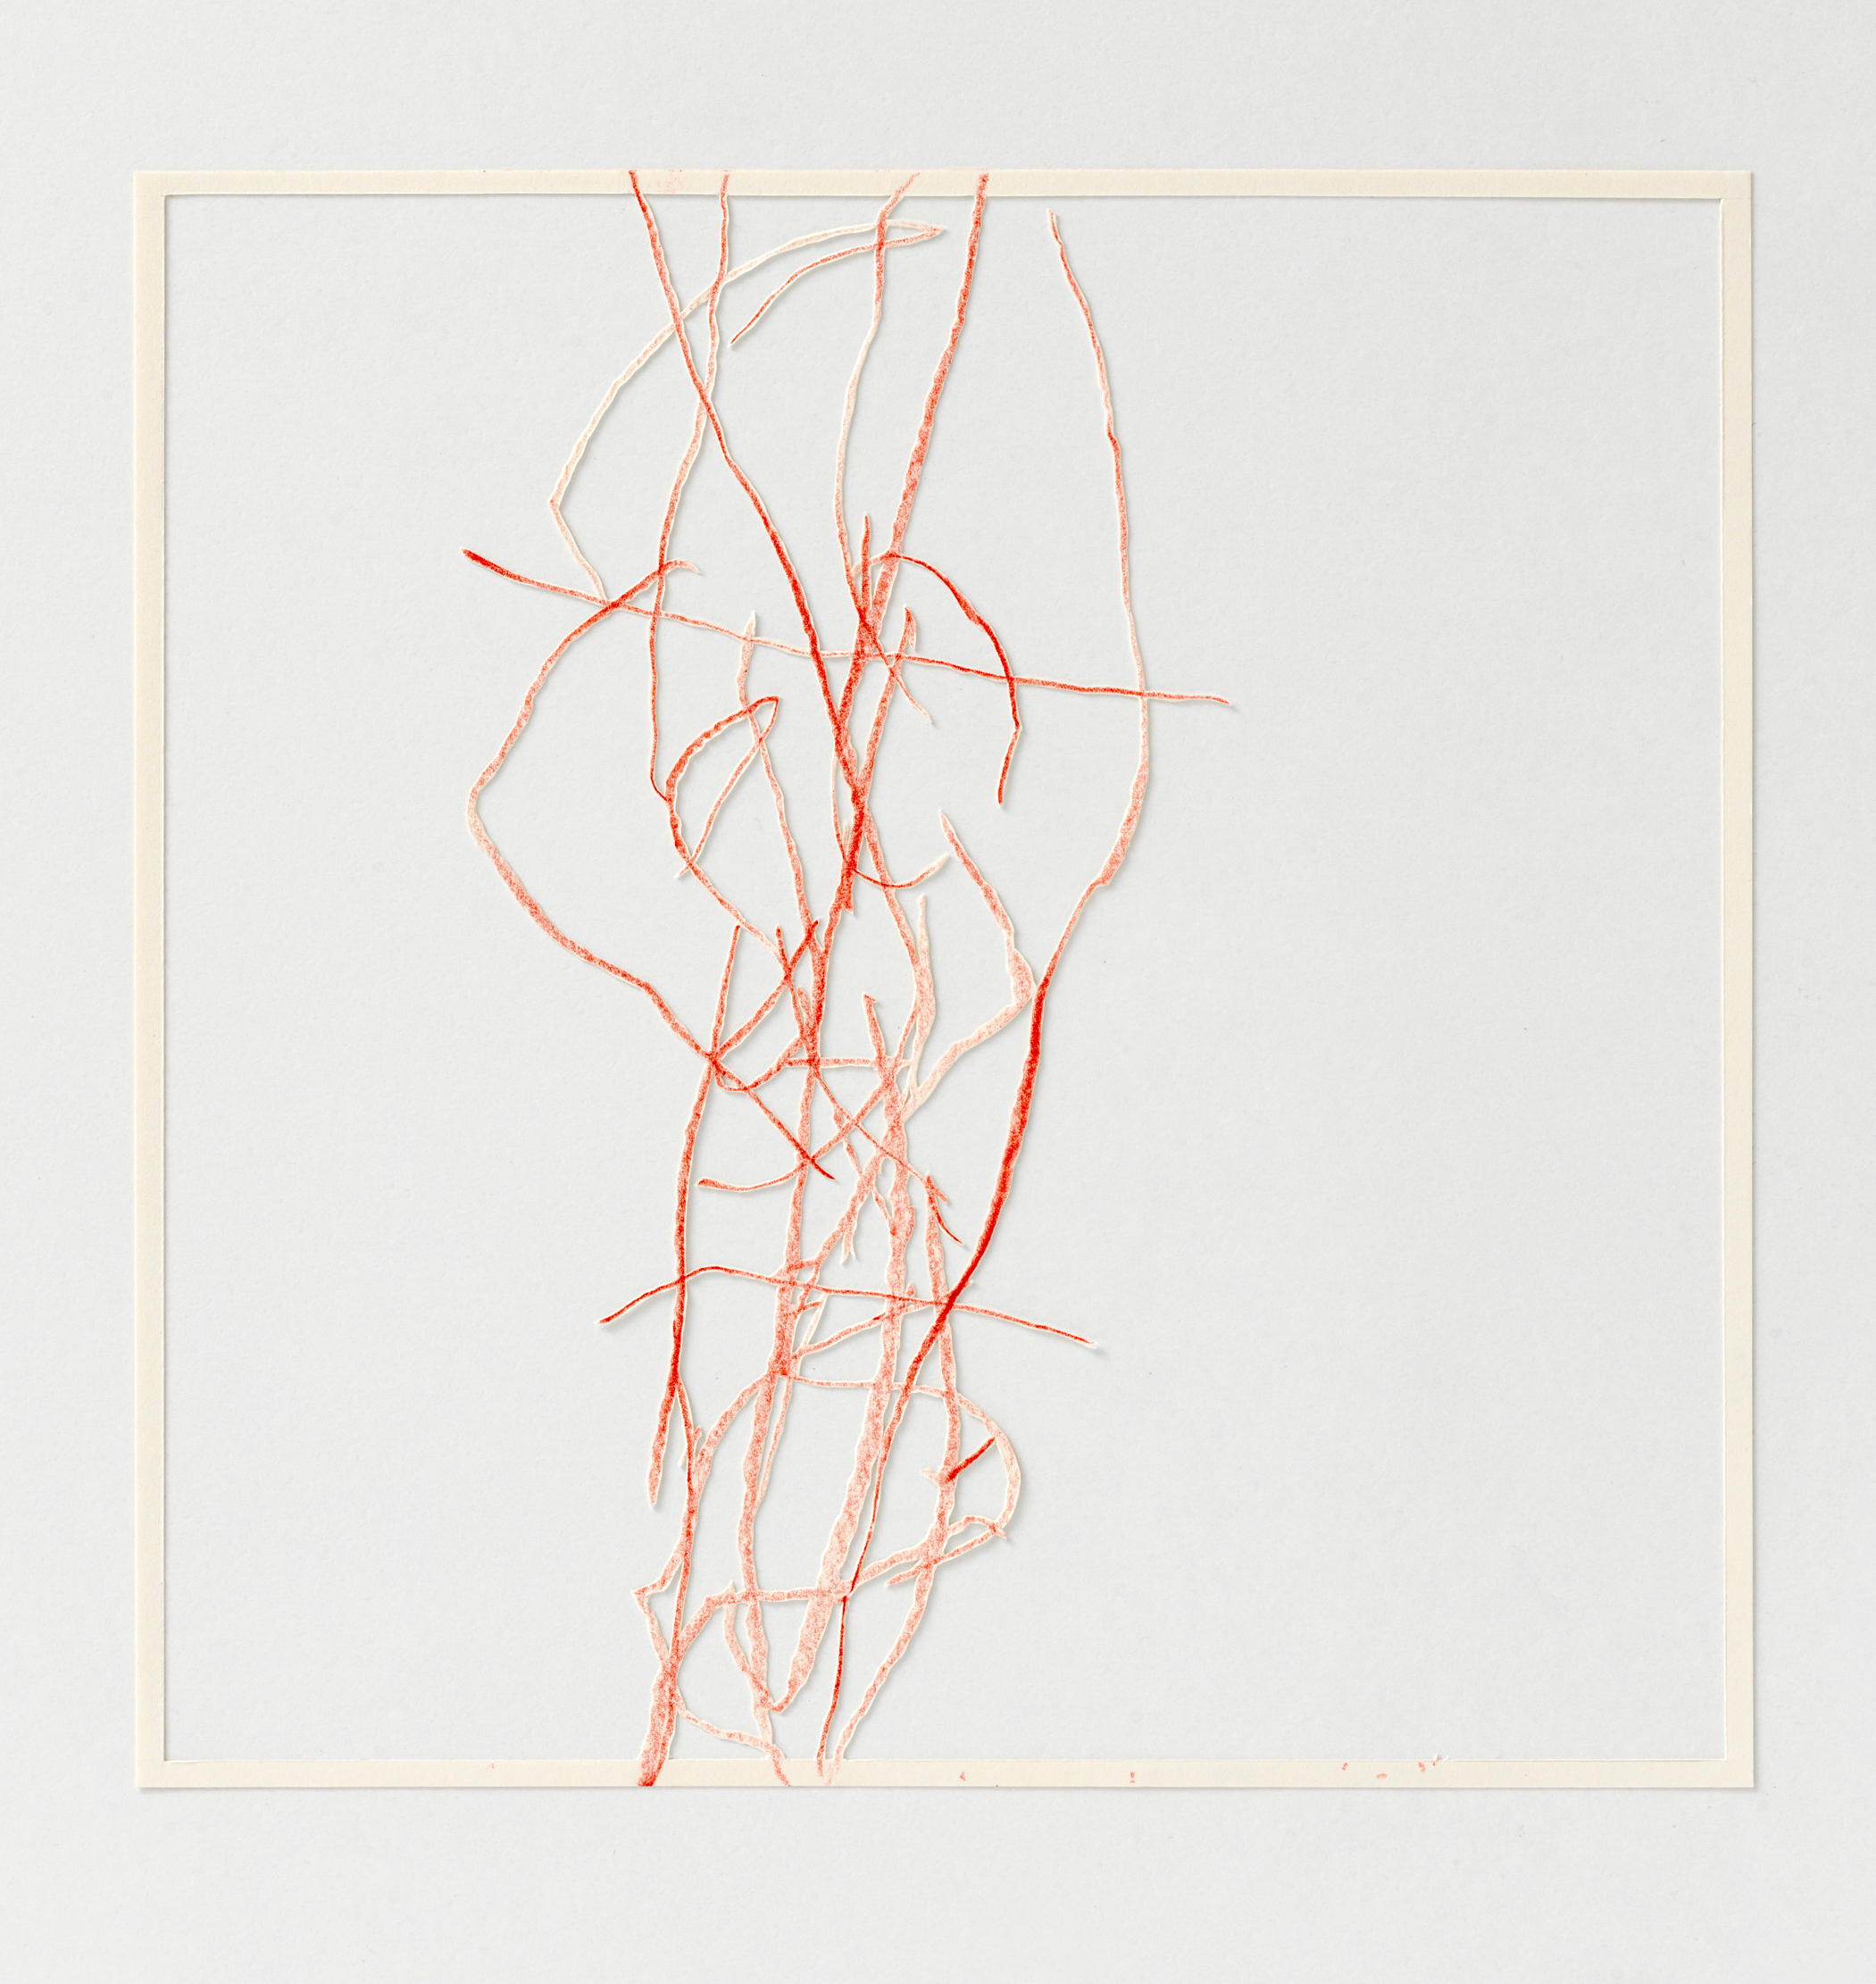 Katharina Hinsberg, Divis 2013-021, 2013, Farbstift auf Papier, ausgeschnitten, 25,5 x 25,5 cm, gerahmt 2